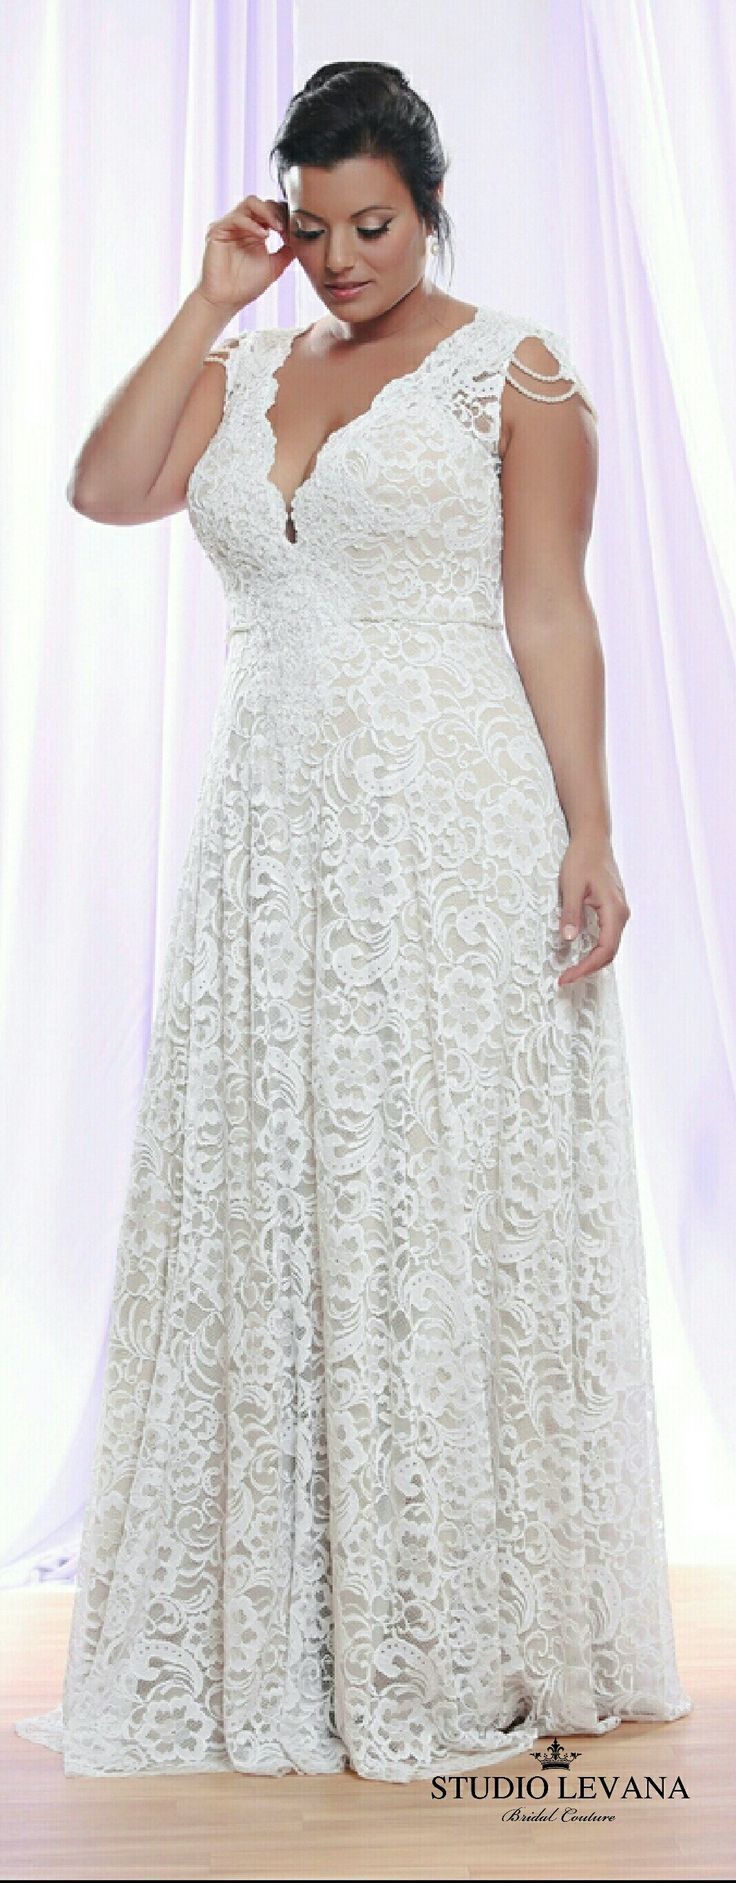 Sleeveles option of Prada plus size lace wedding gown-signature Studio Levana dress